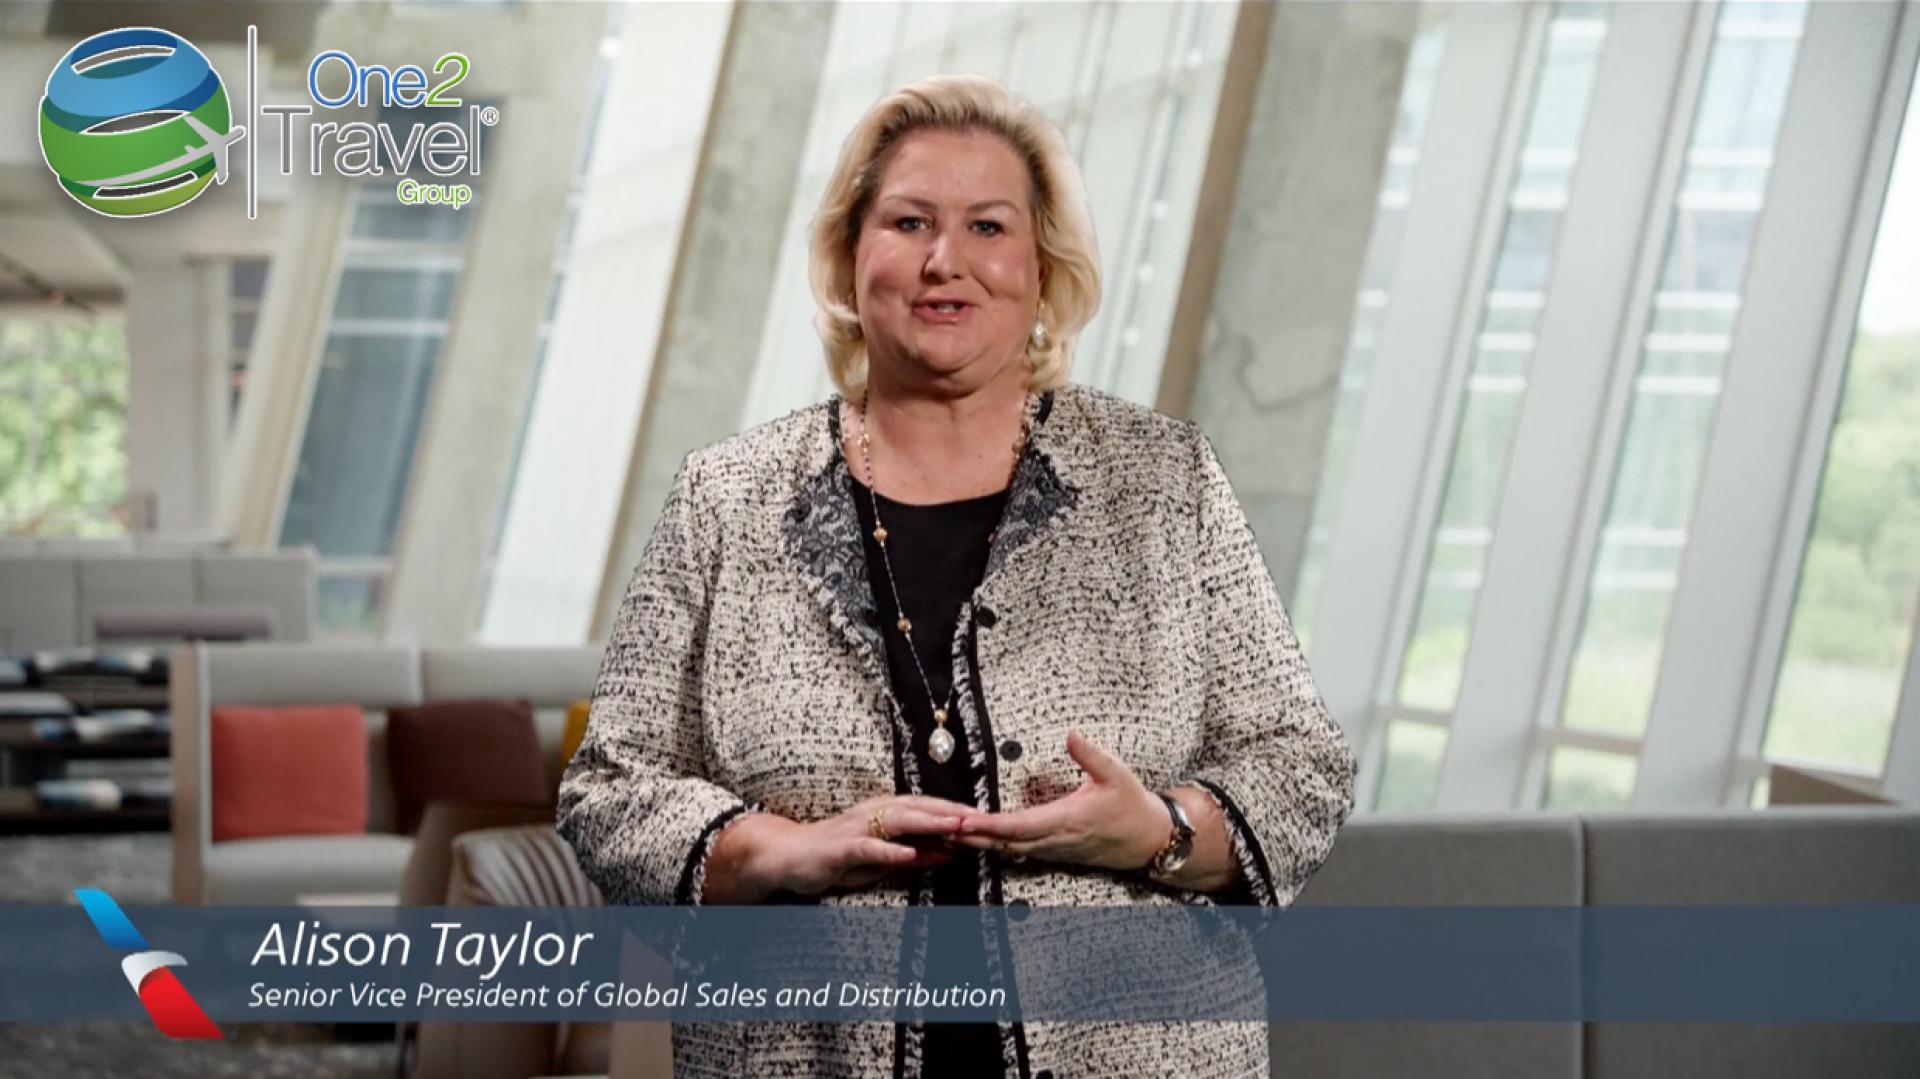 Un videomensaje de Alison Taylor - American Airlines